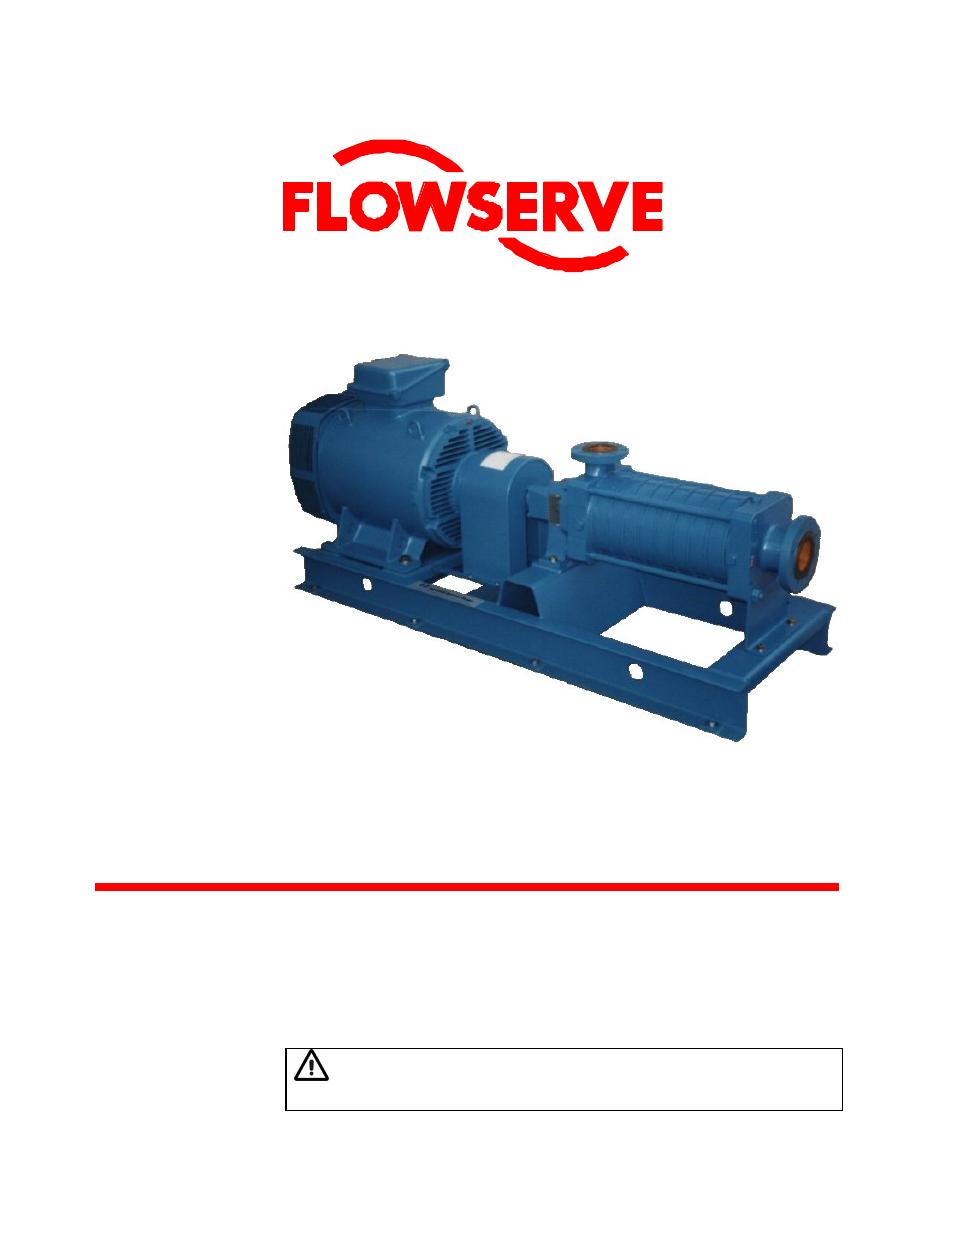 flowserve wdx user manual 46 pages rh manualsdir com flowserve centrifugal pump manual flowserve vertical pump manual